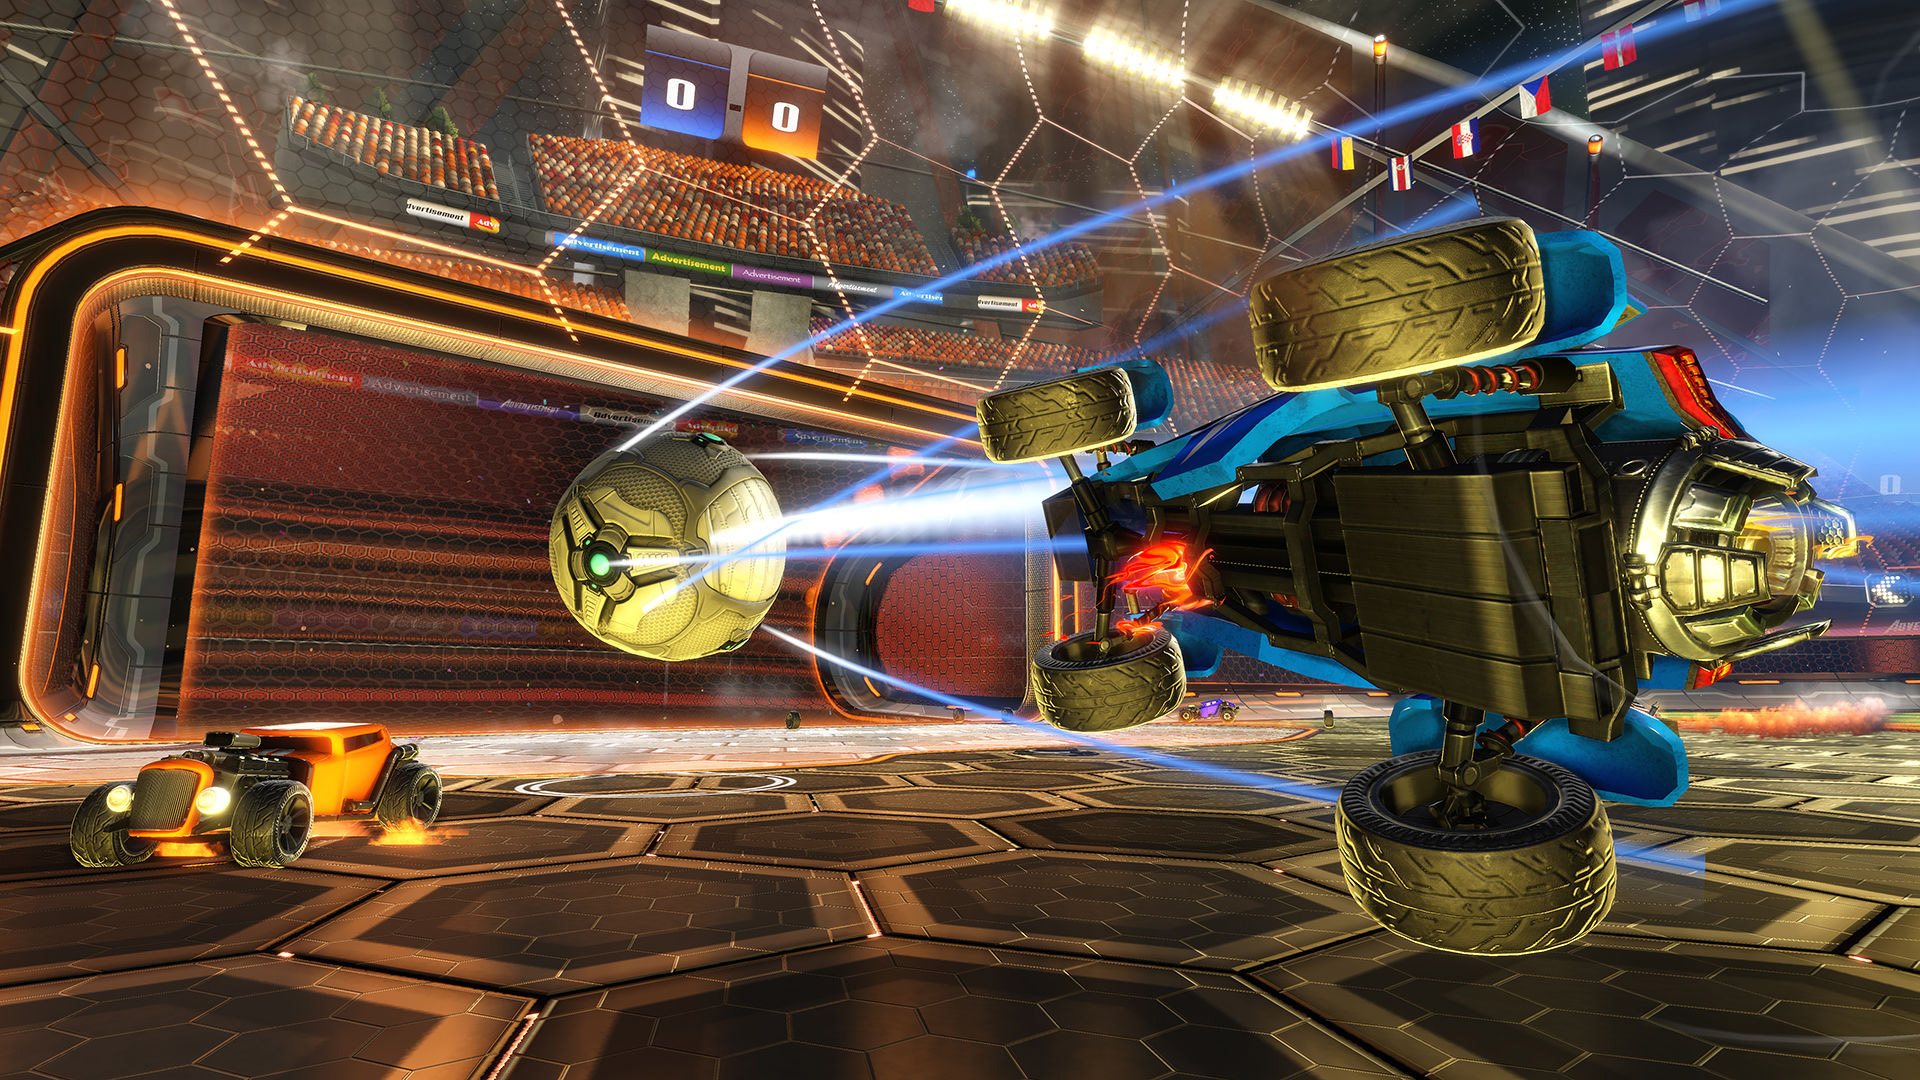 Rocket League - VGProfessional Review (9)